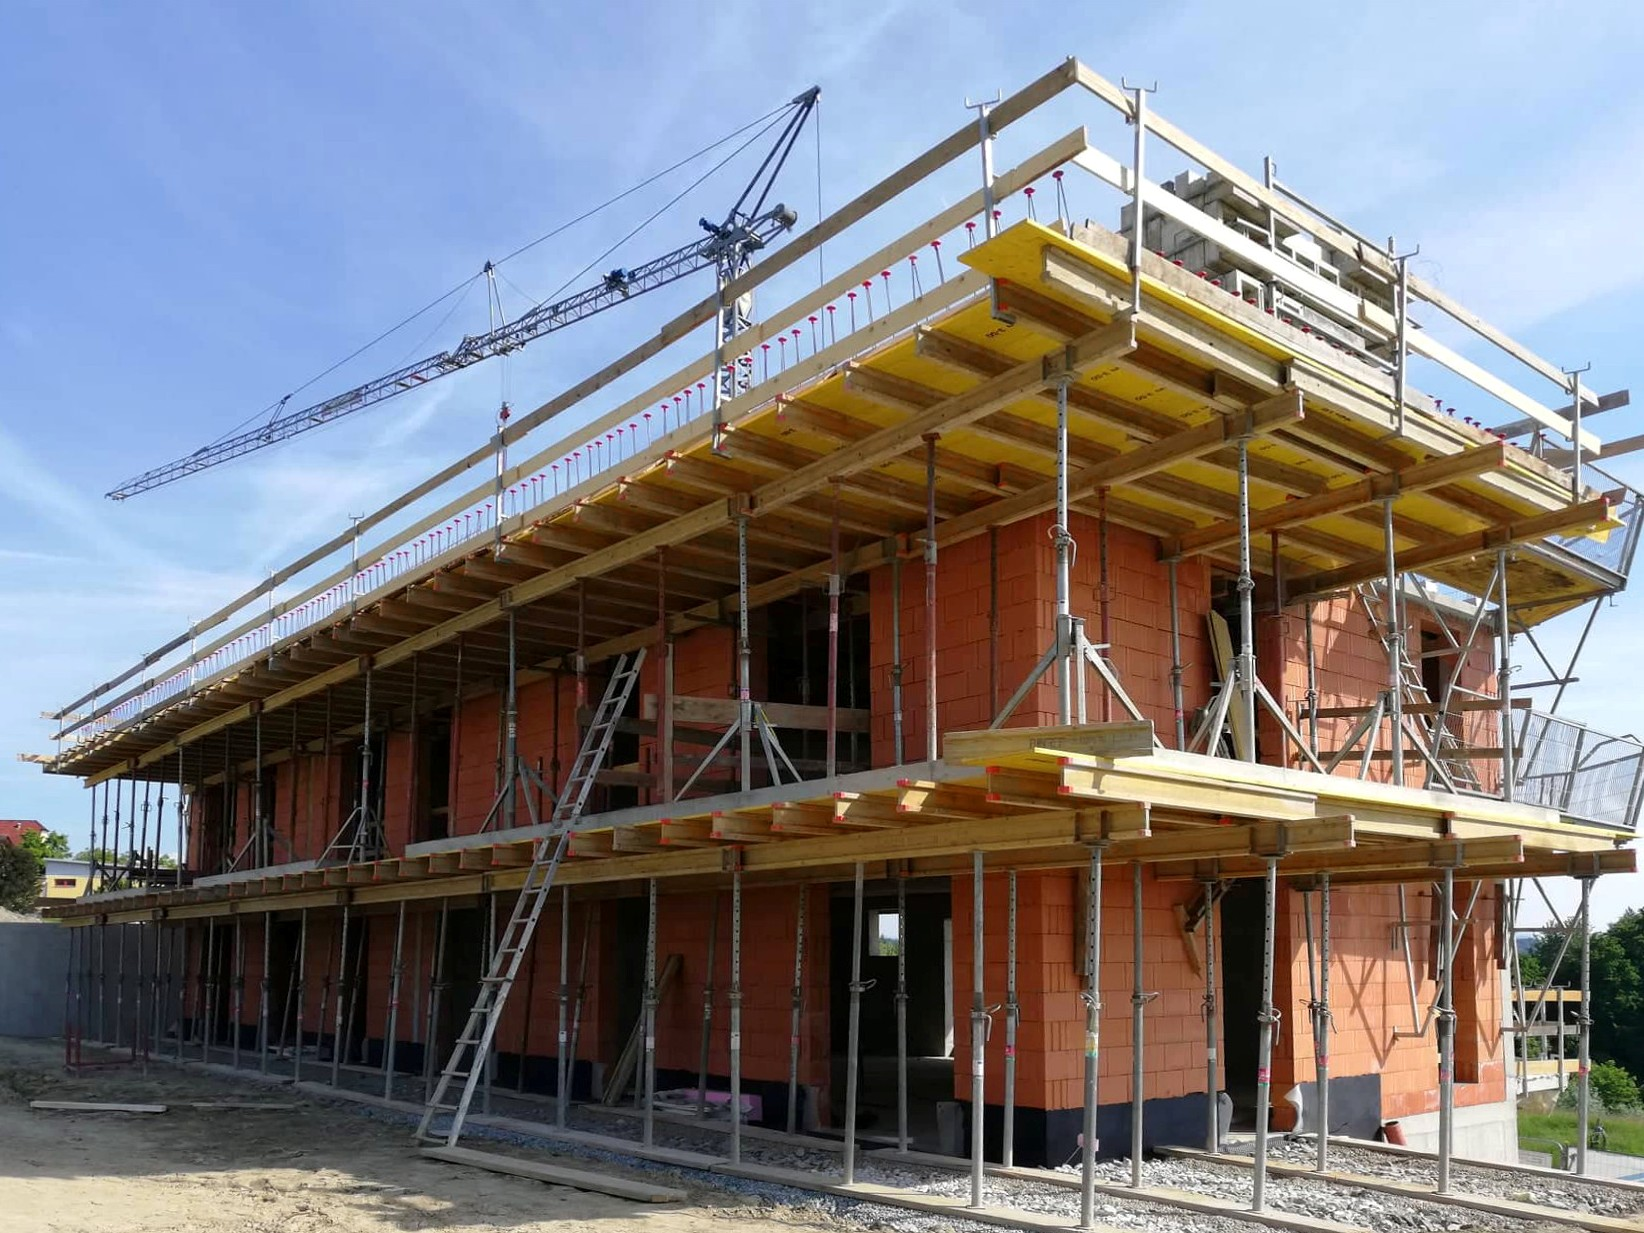 Wohnbau in Ziegelmassivbauweise - Baufirma Kiegerl